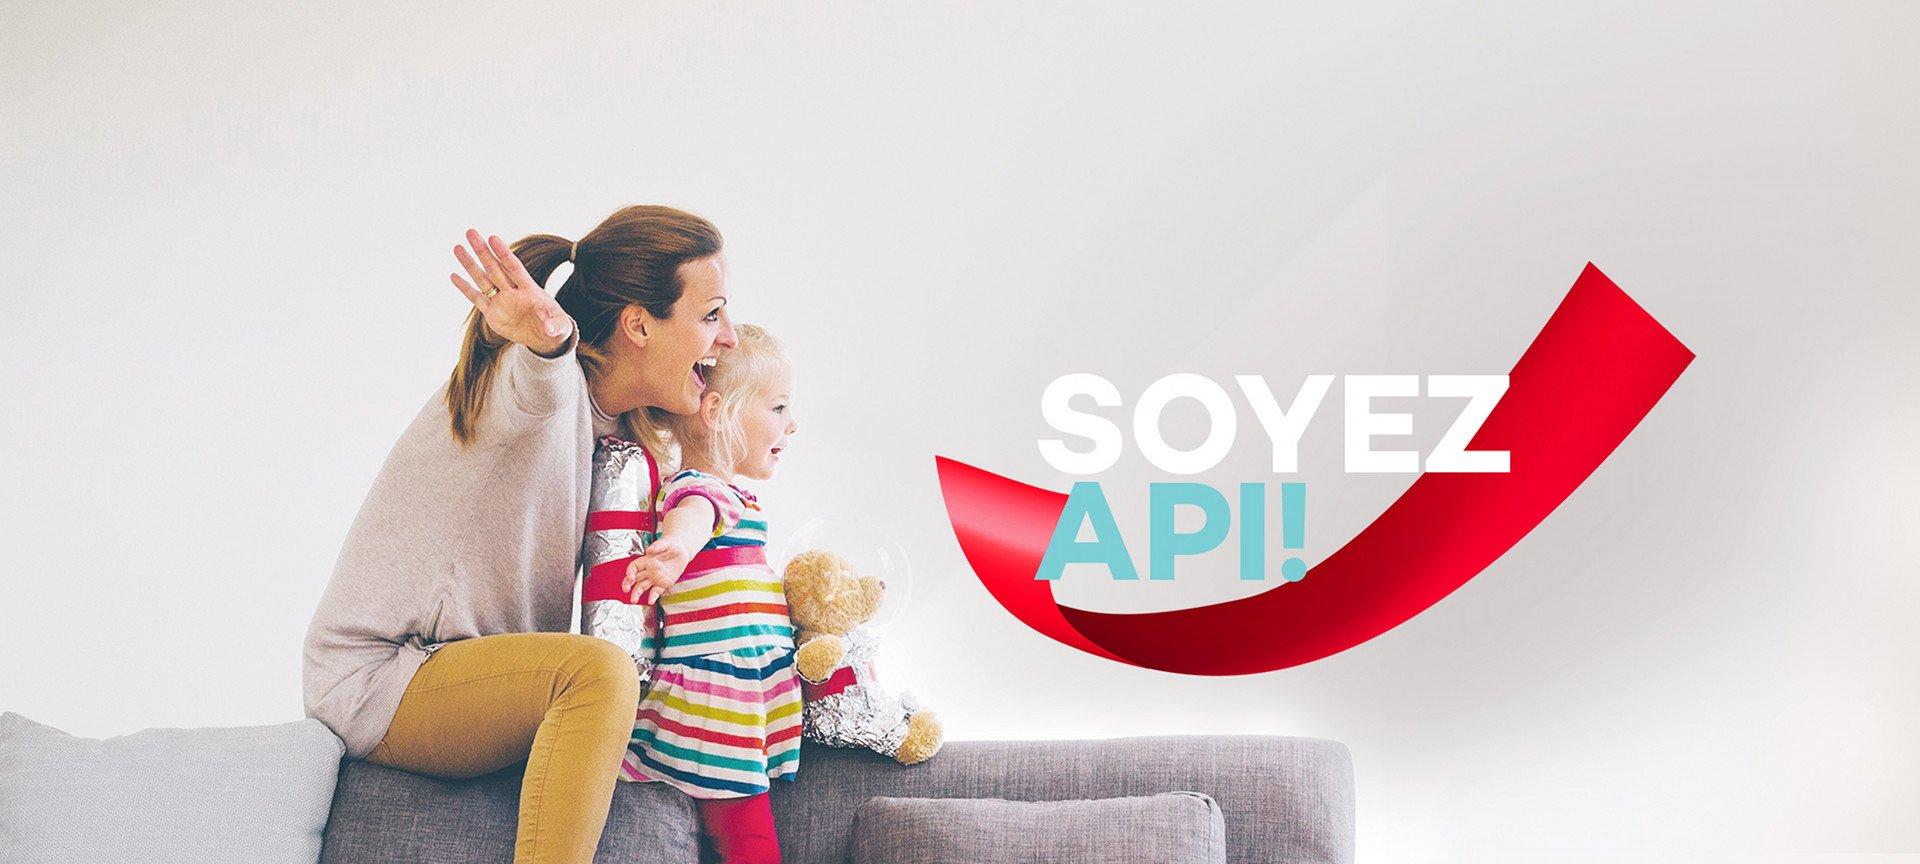 Soyez API